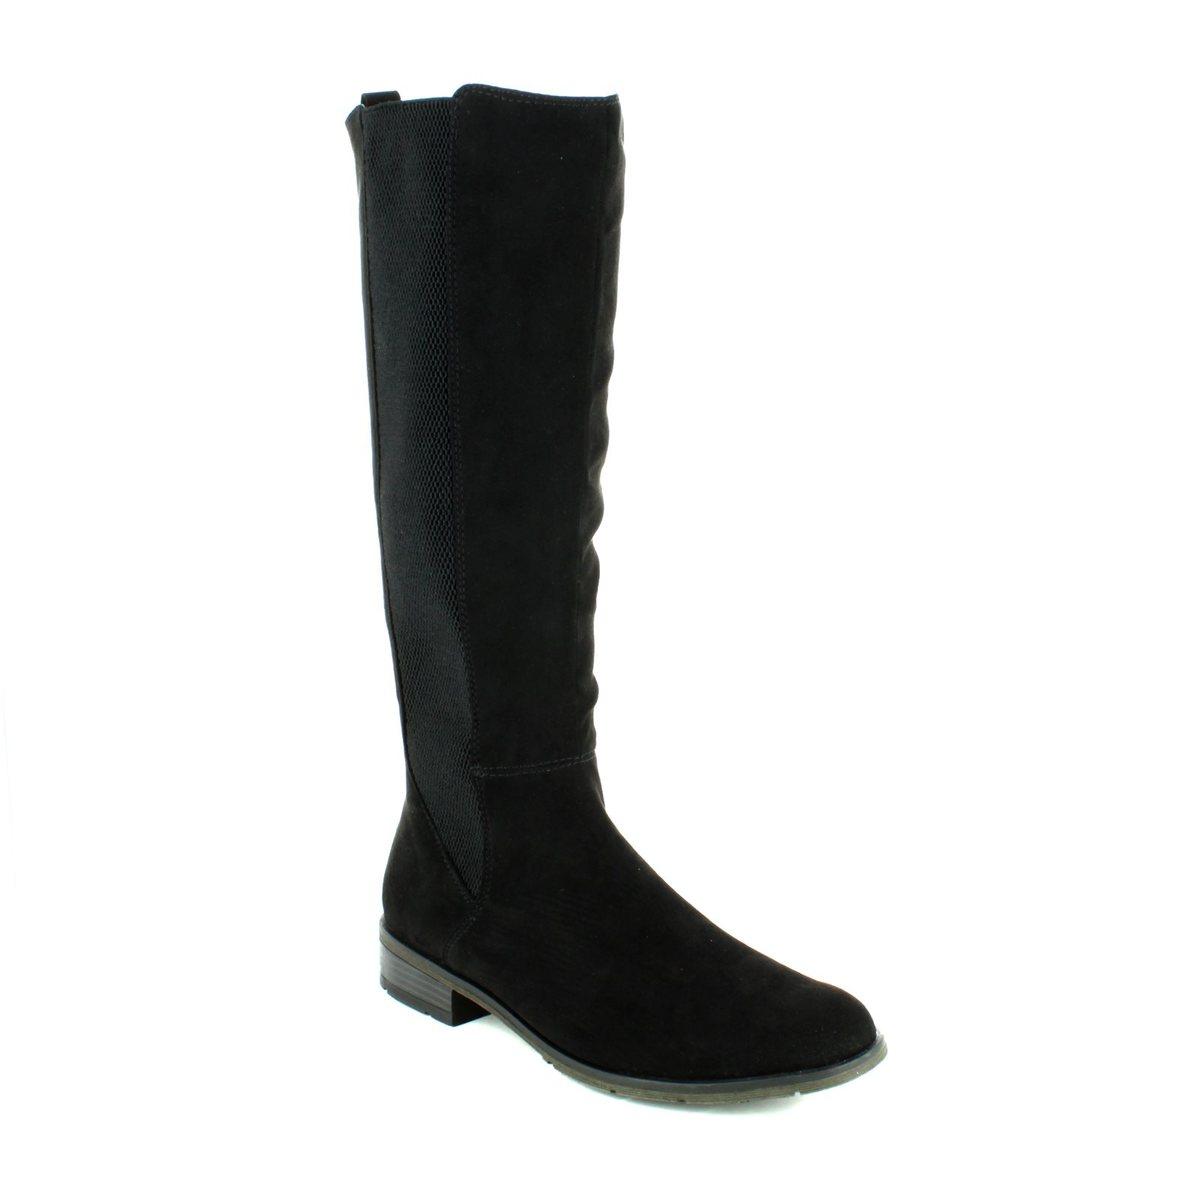 fb06efdb4ea Marco Tozzi Knee-high Boots - Black suede - 25528 001 RAPALONG